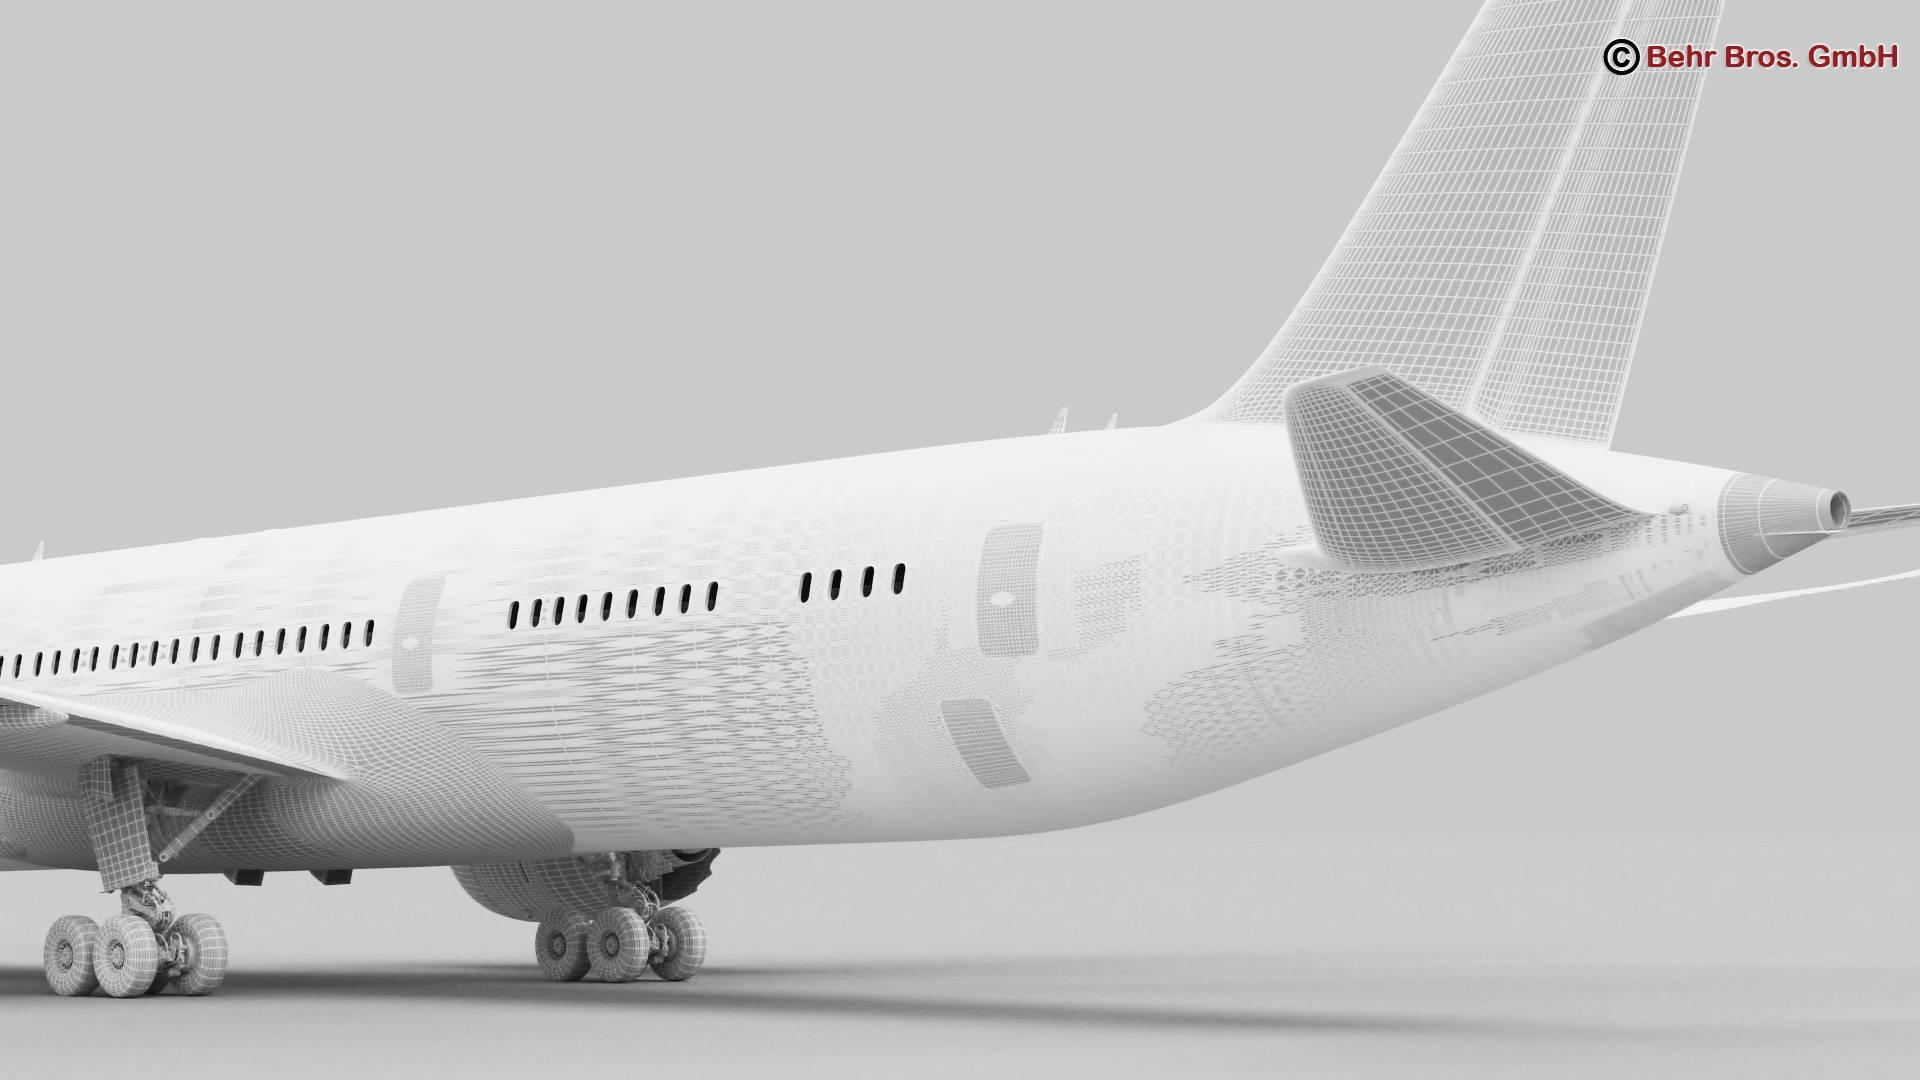 Boeing 787-8 3d gerð 3ds max fbx c4d lwo ma mb obj 251376